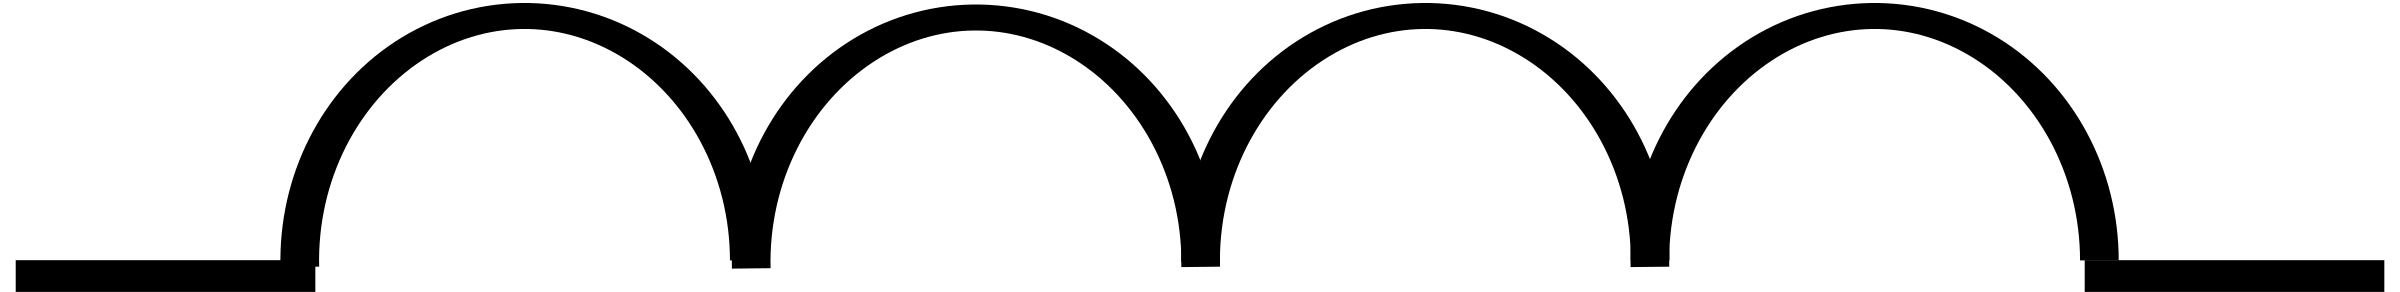 Clipart - RSA IEC Inductor Symbol-2